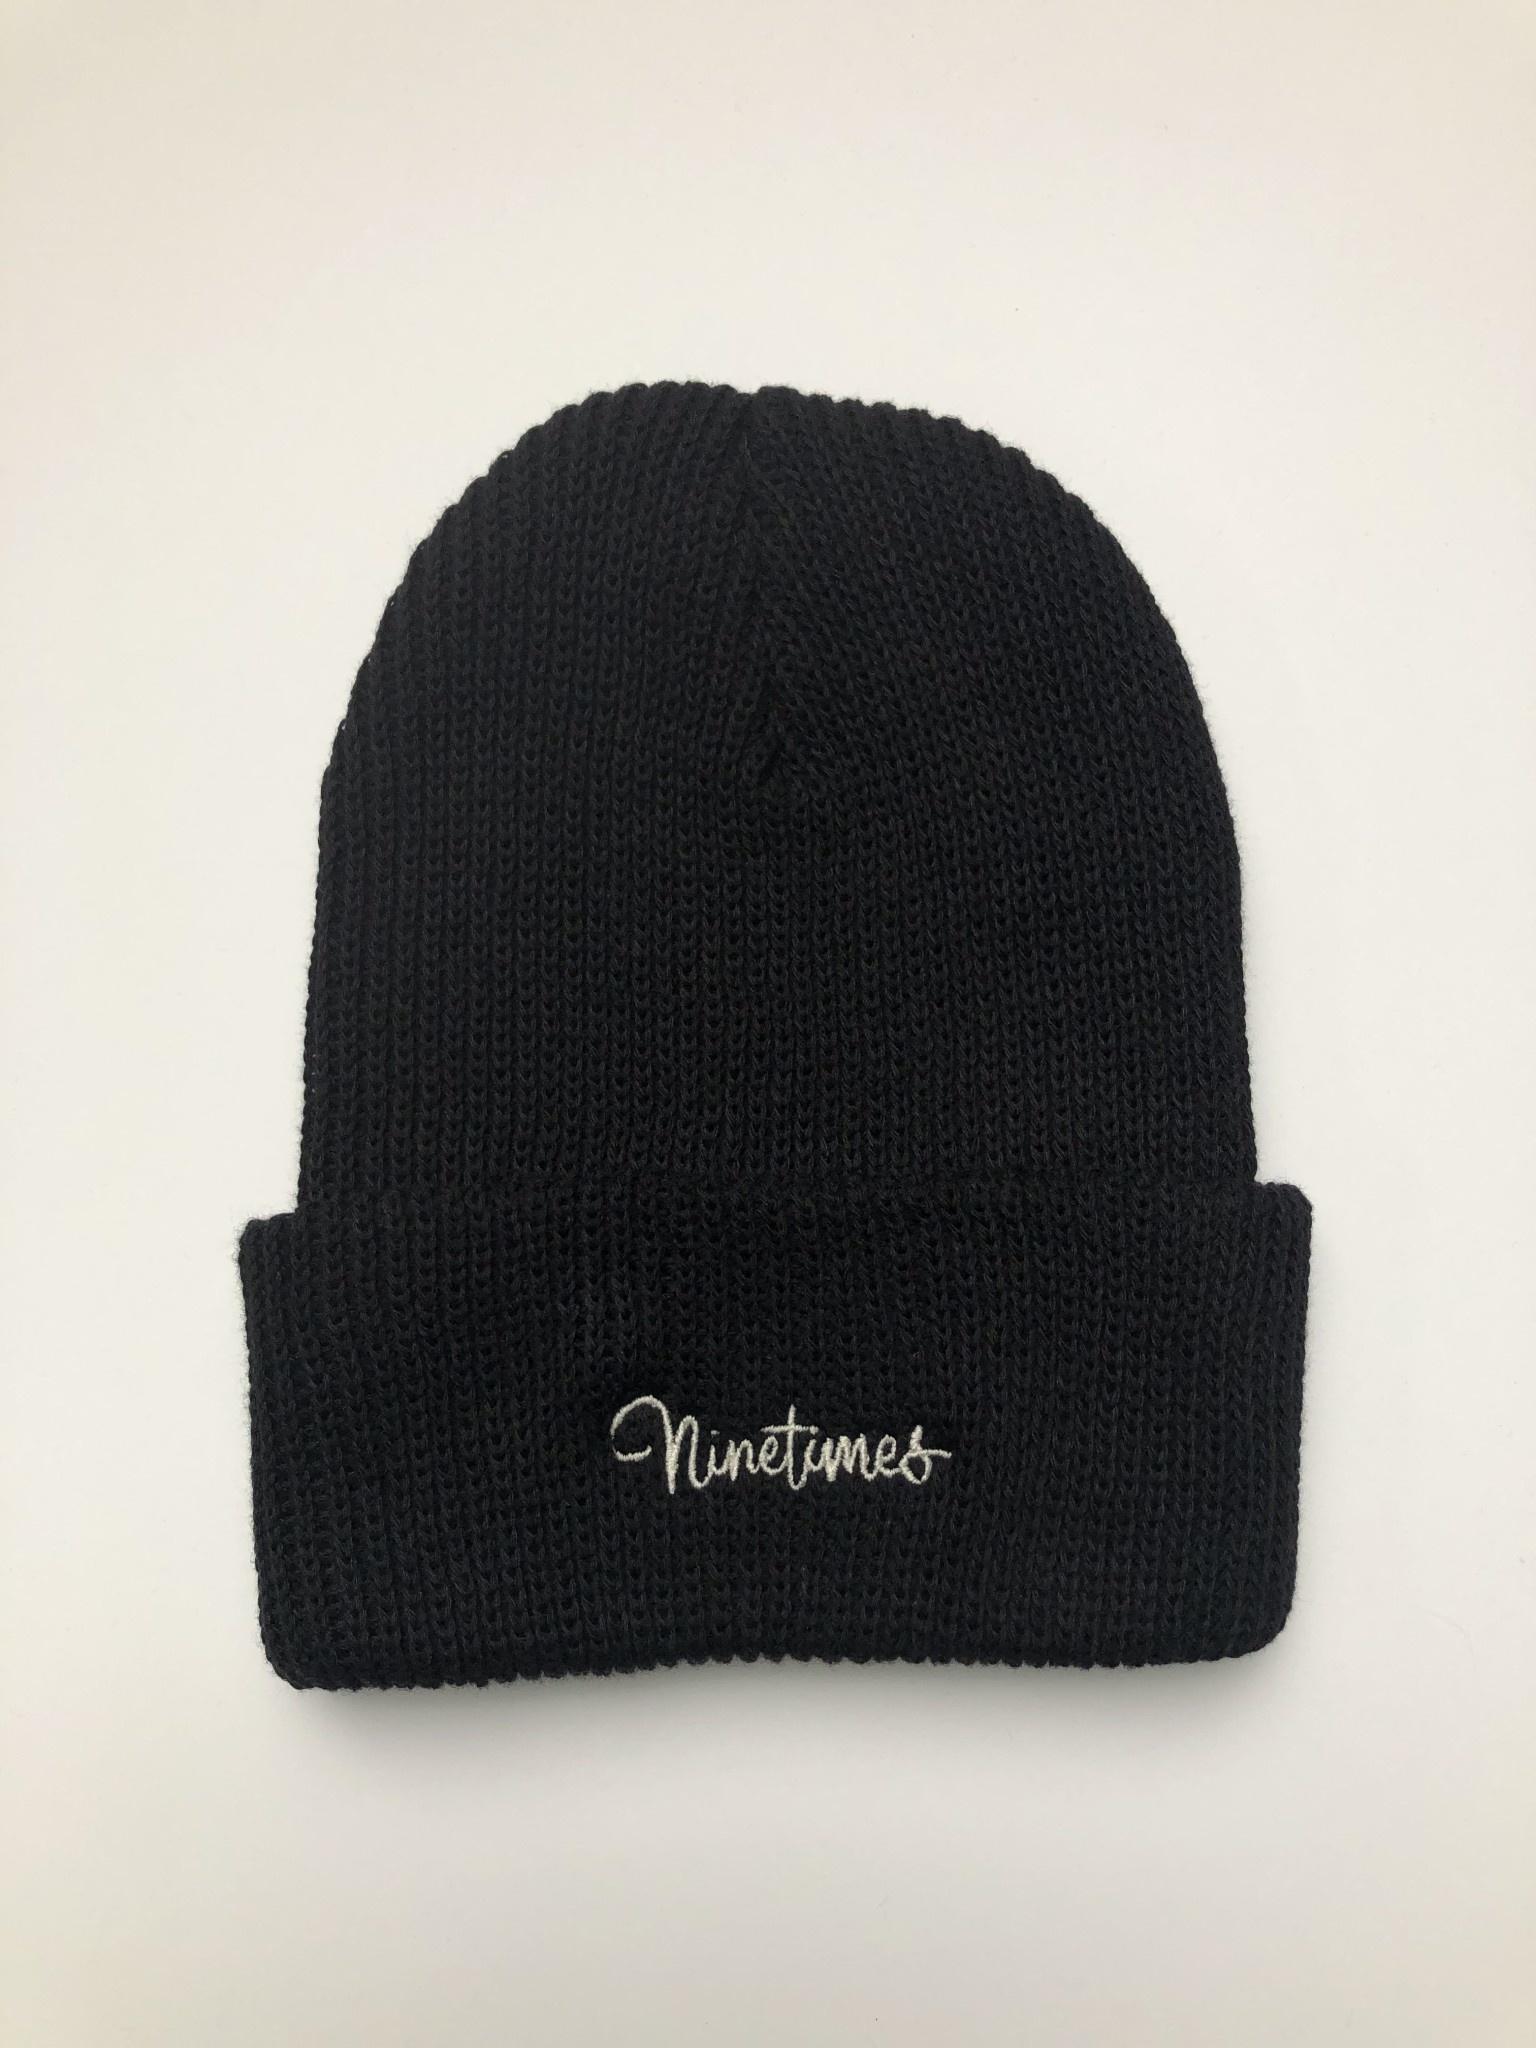 Ninetimes Ninetimes Script Embroidered Beanie - Black